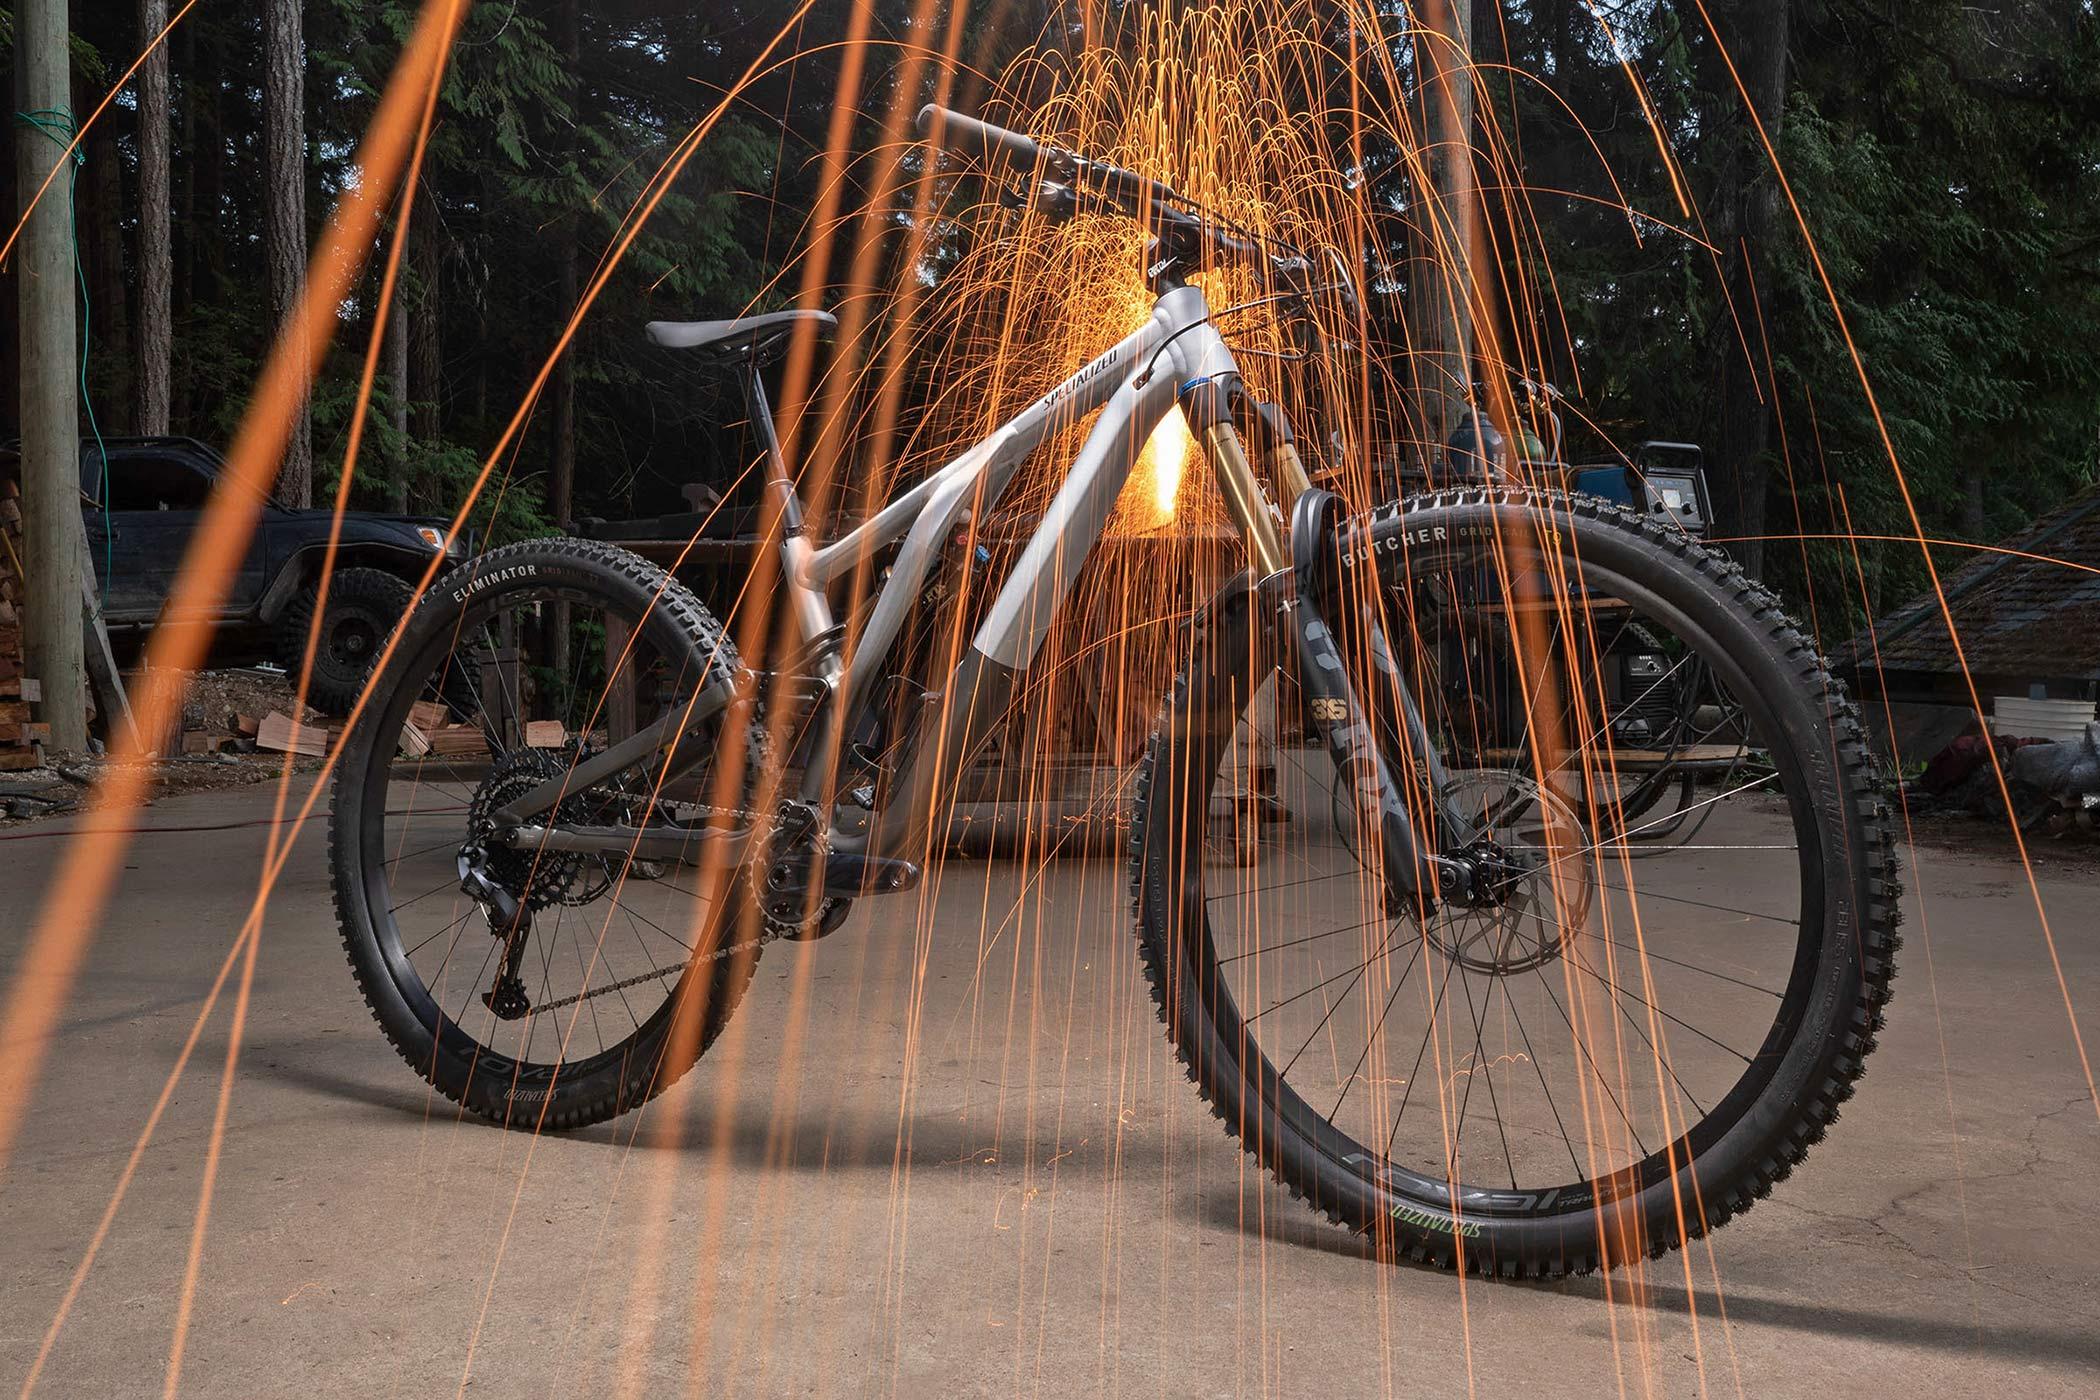 2022 Specialized Stumpjumper EVO Alloy trail bike, sparks